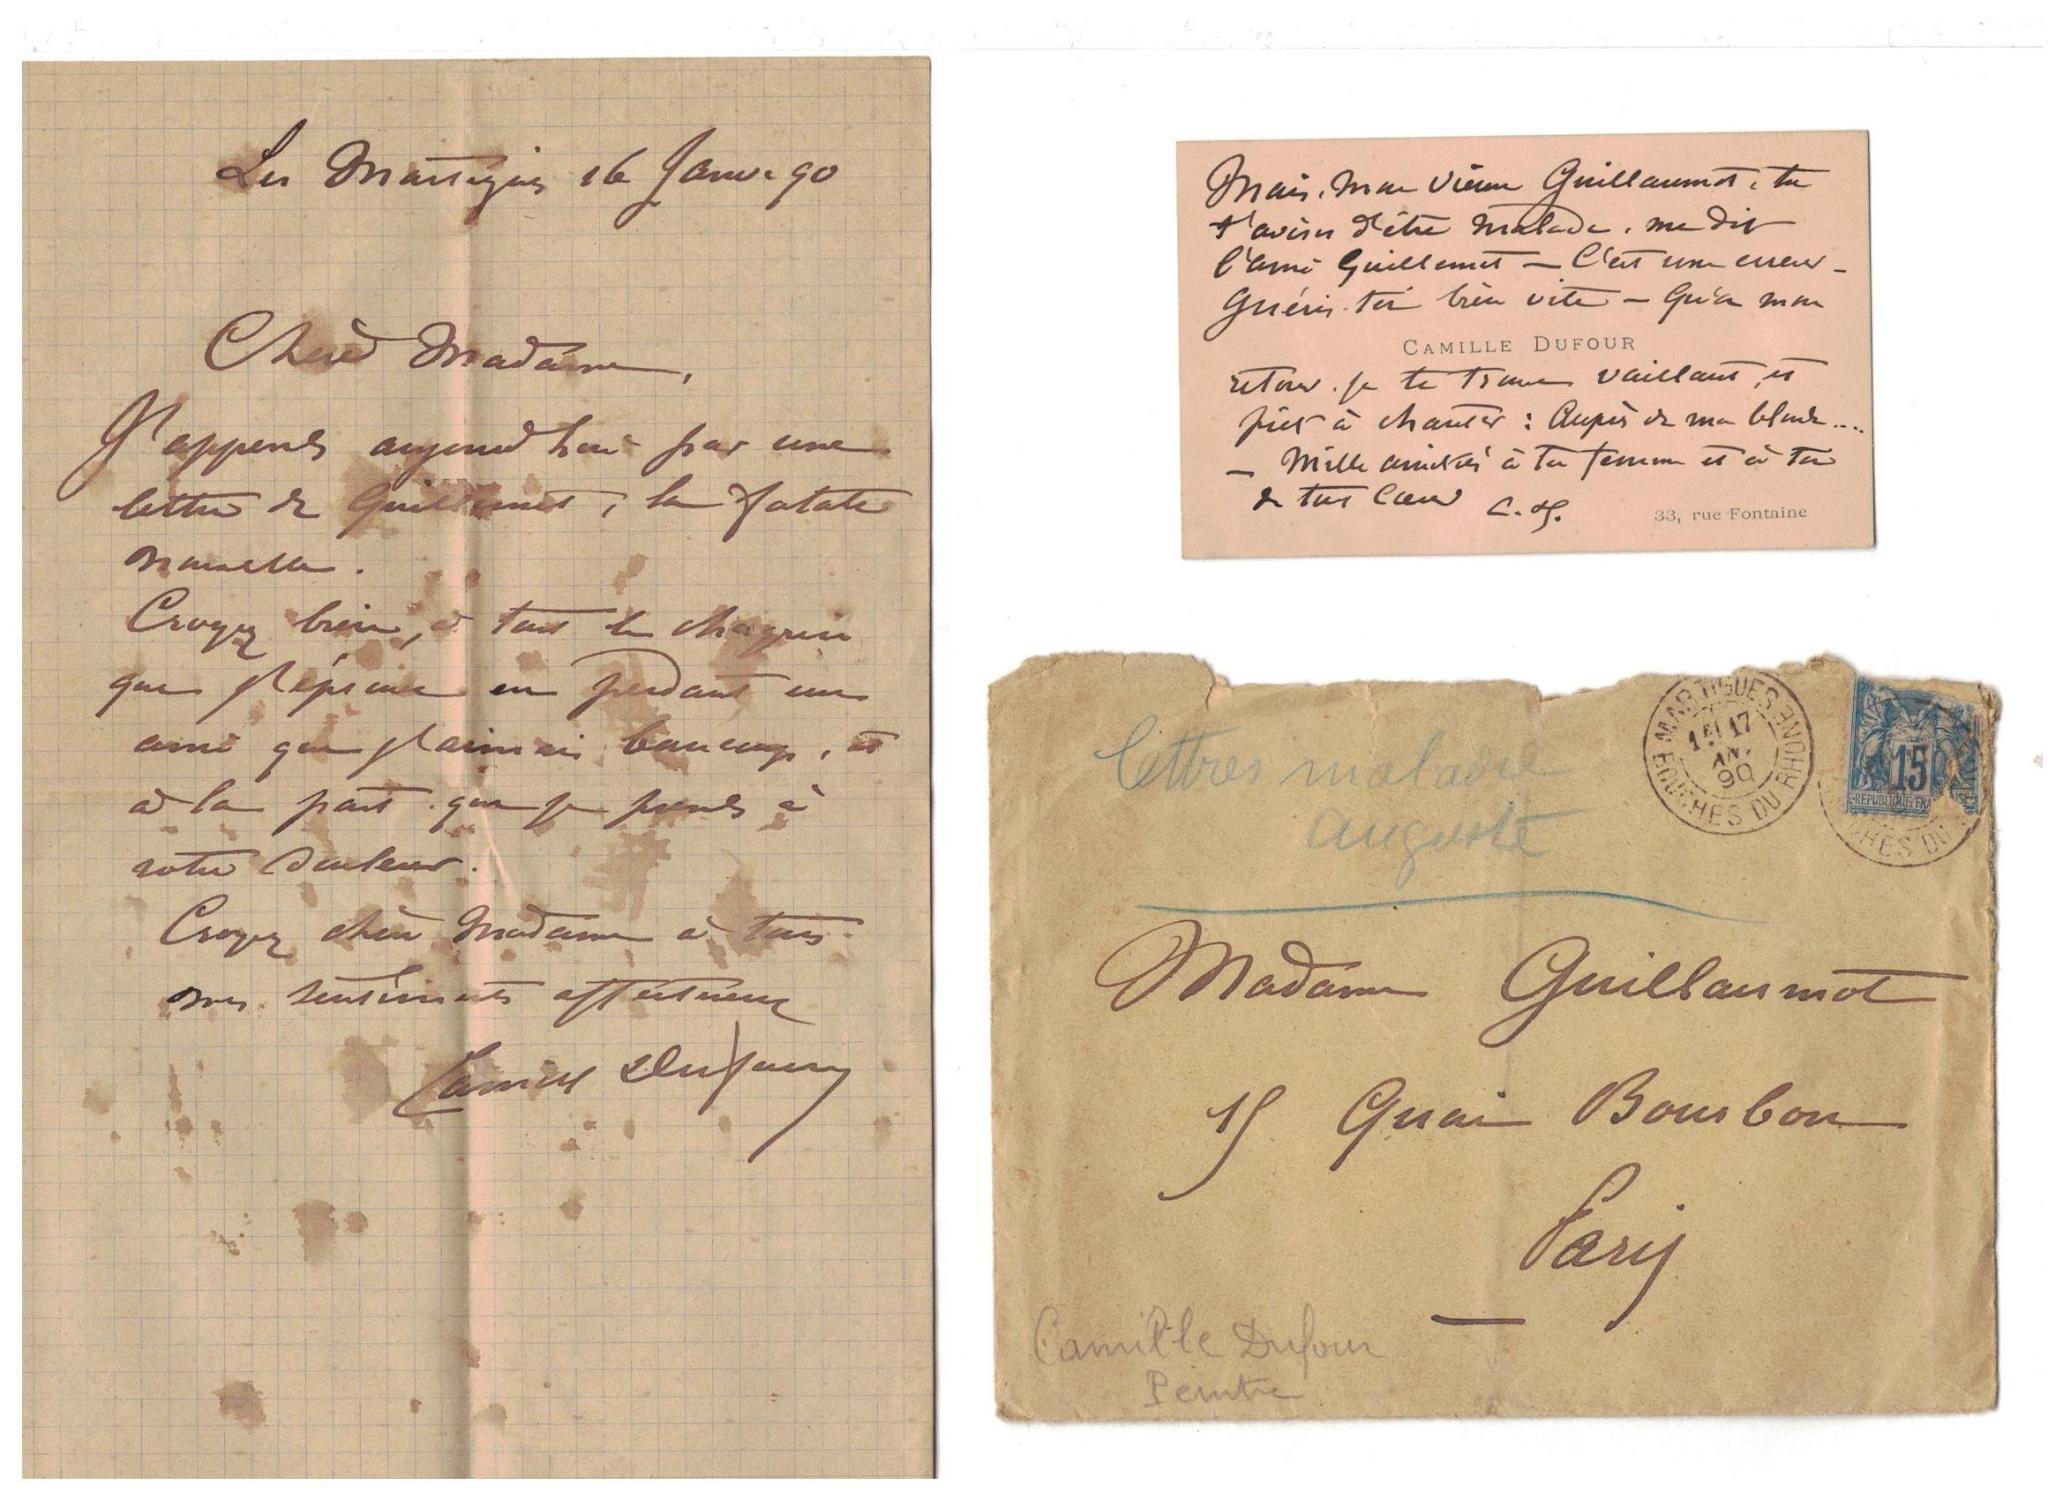 2 Pieces Manuscrites 1 Carte De Visite Manuscrite Adressee Au Peintre Auguste Guillaumot Alors